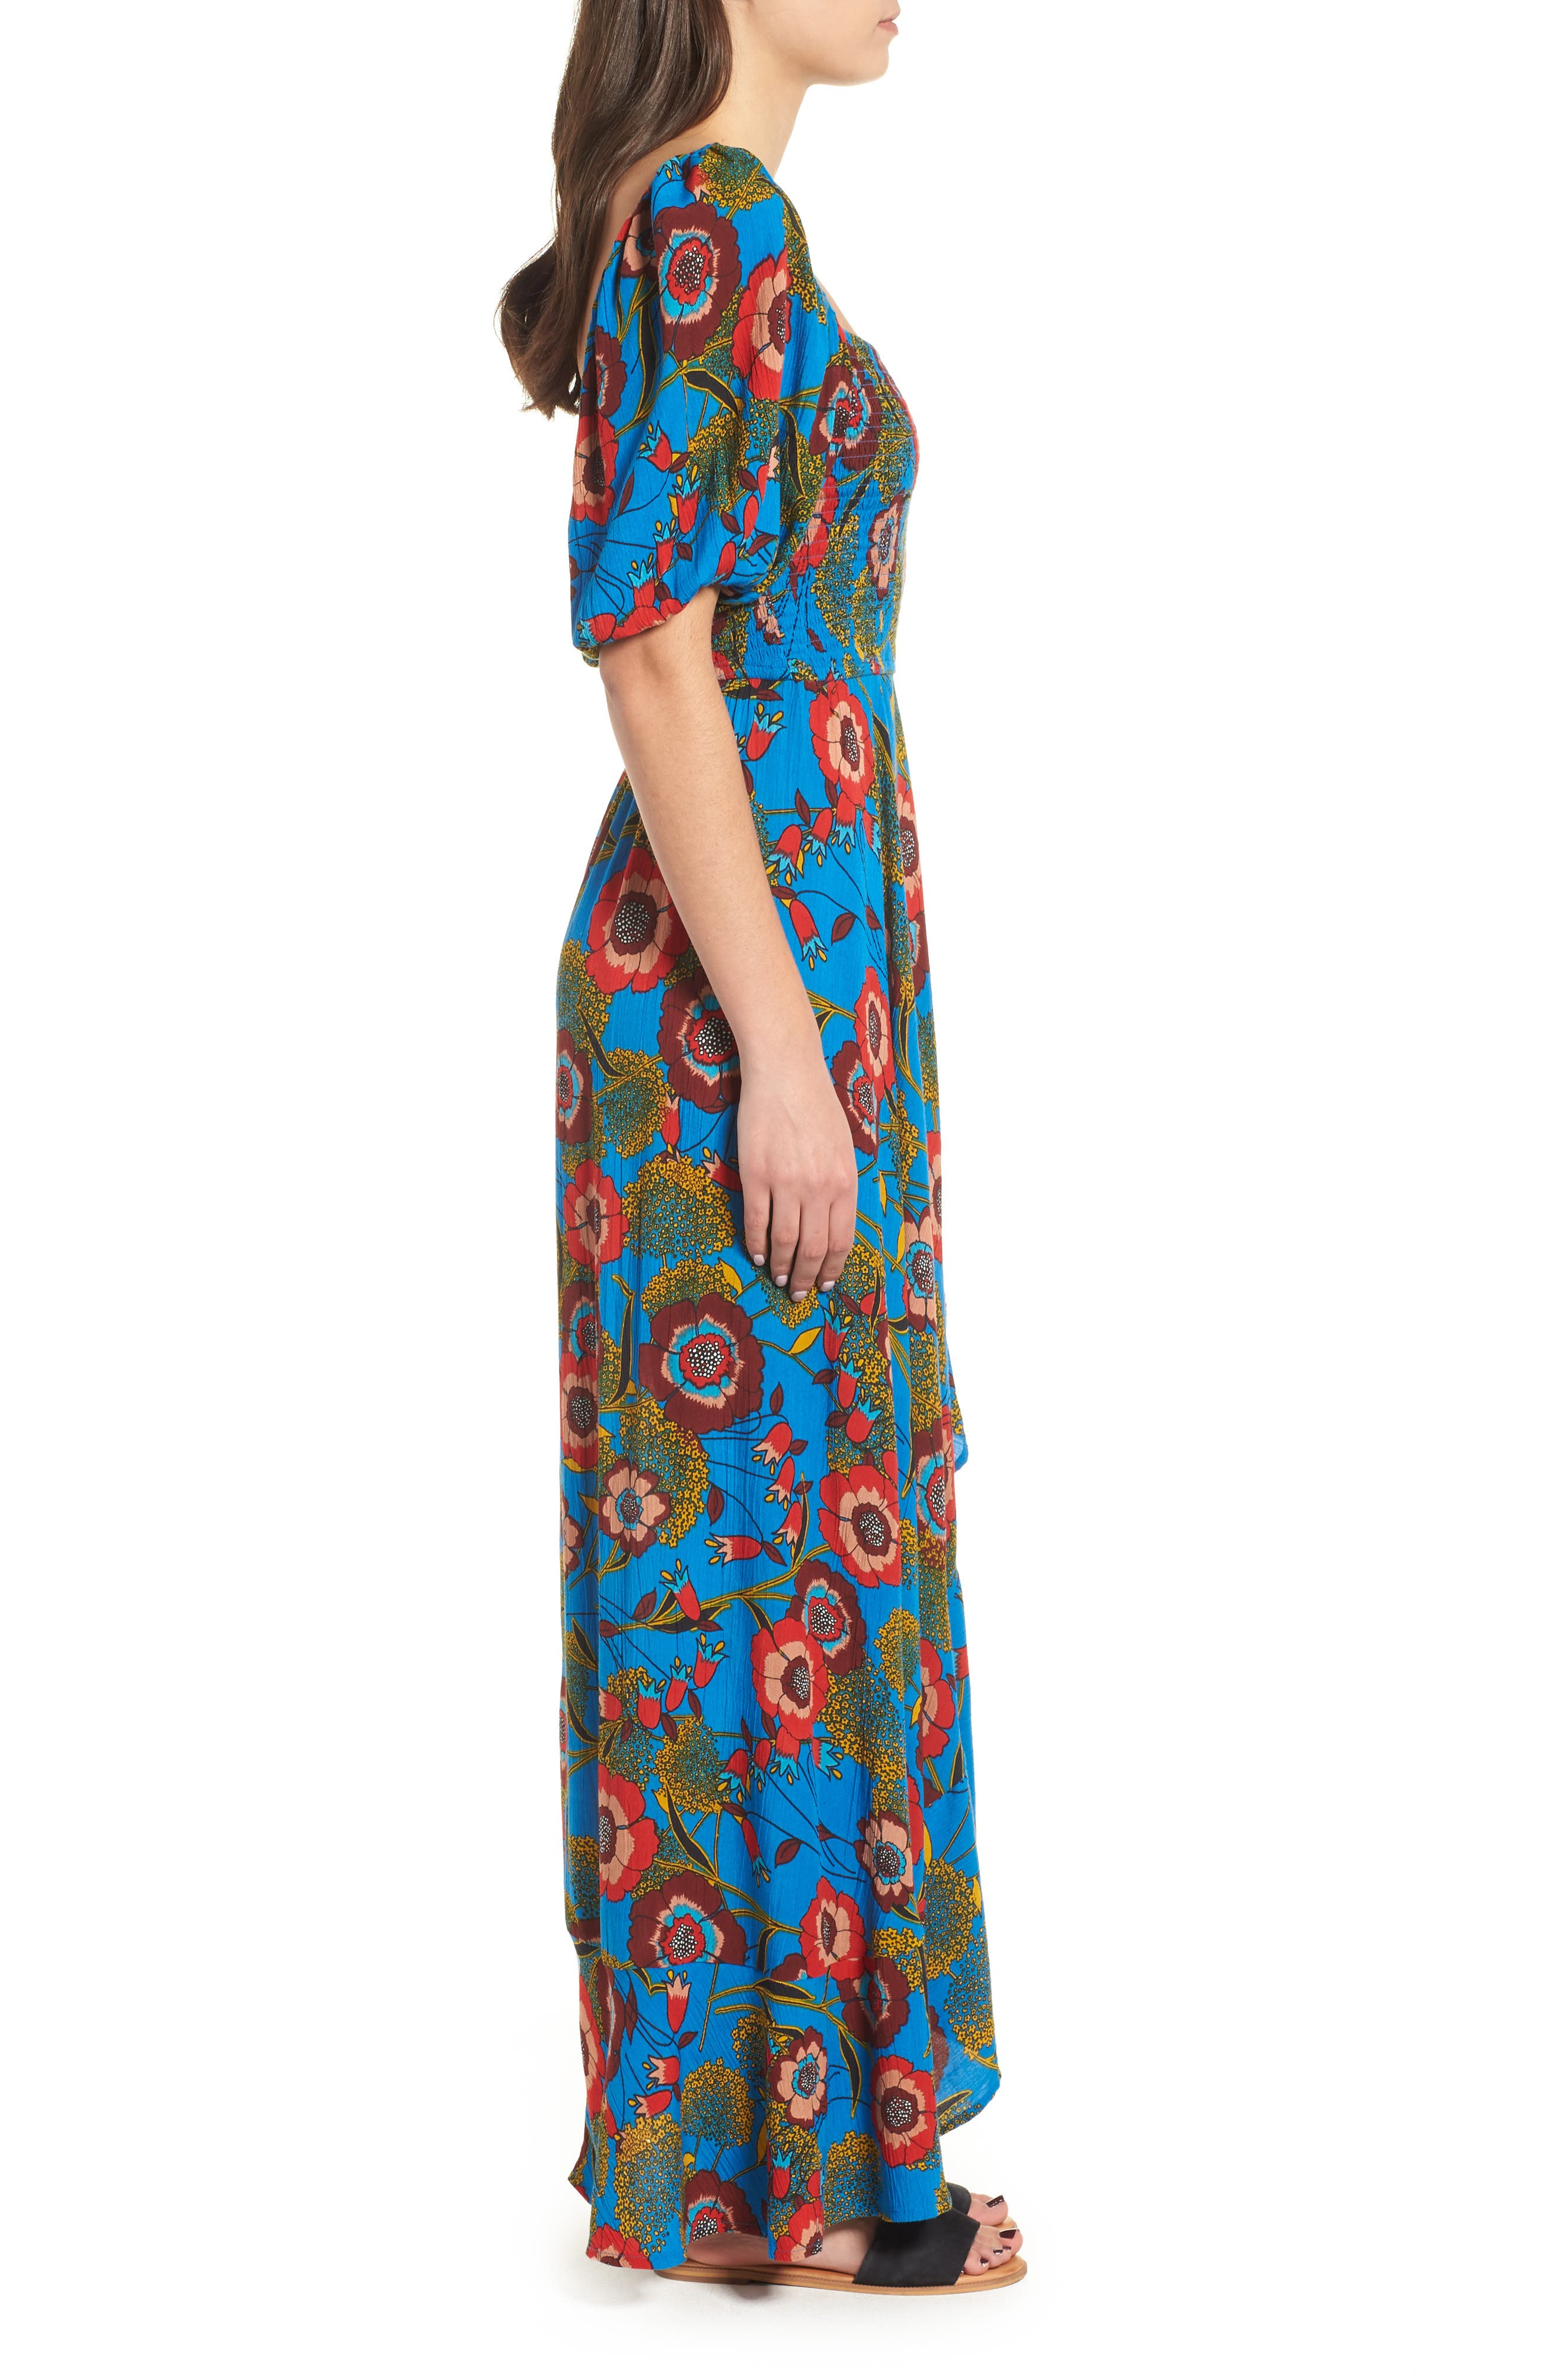 Heirloom Blossom Maxi Dress,                             Alternate thumbnail 3, color,                             Royal/ Blue/ Red